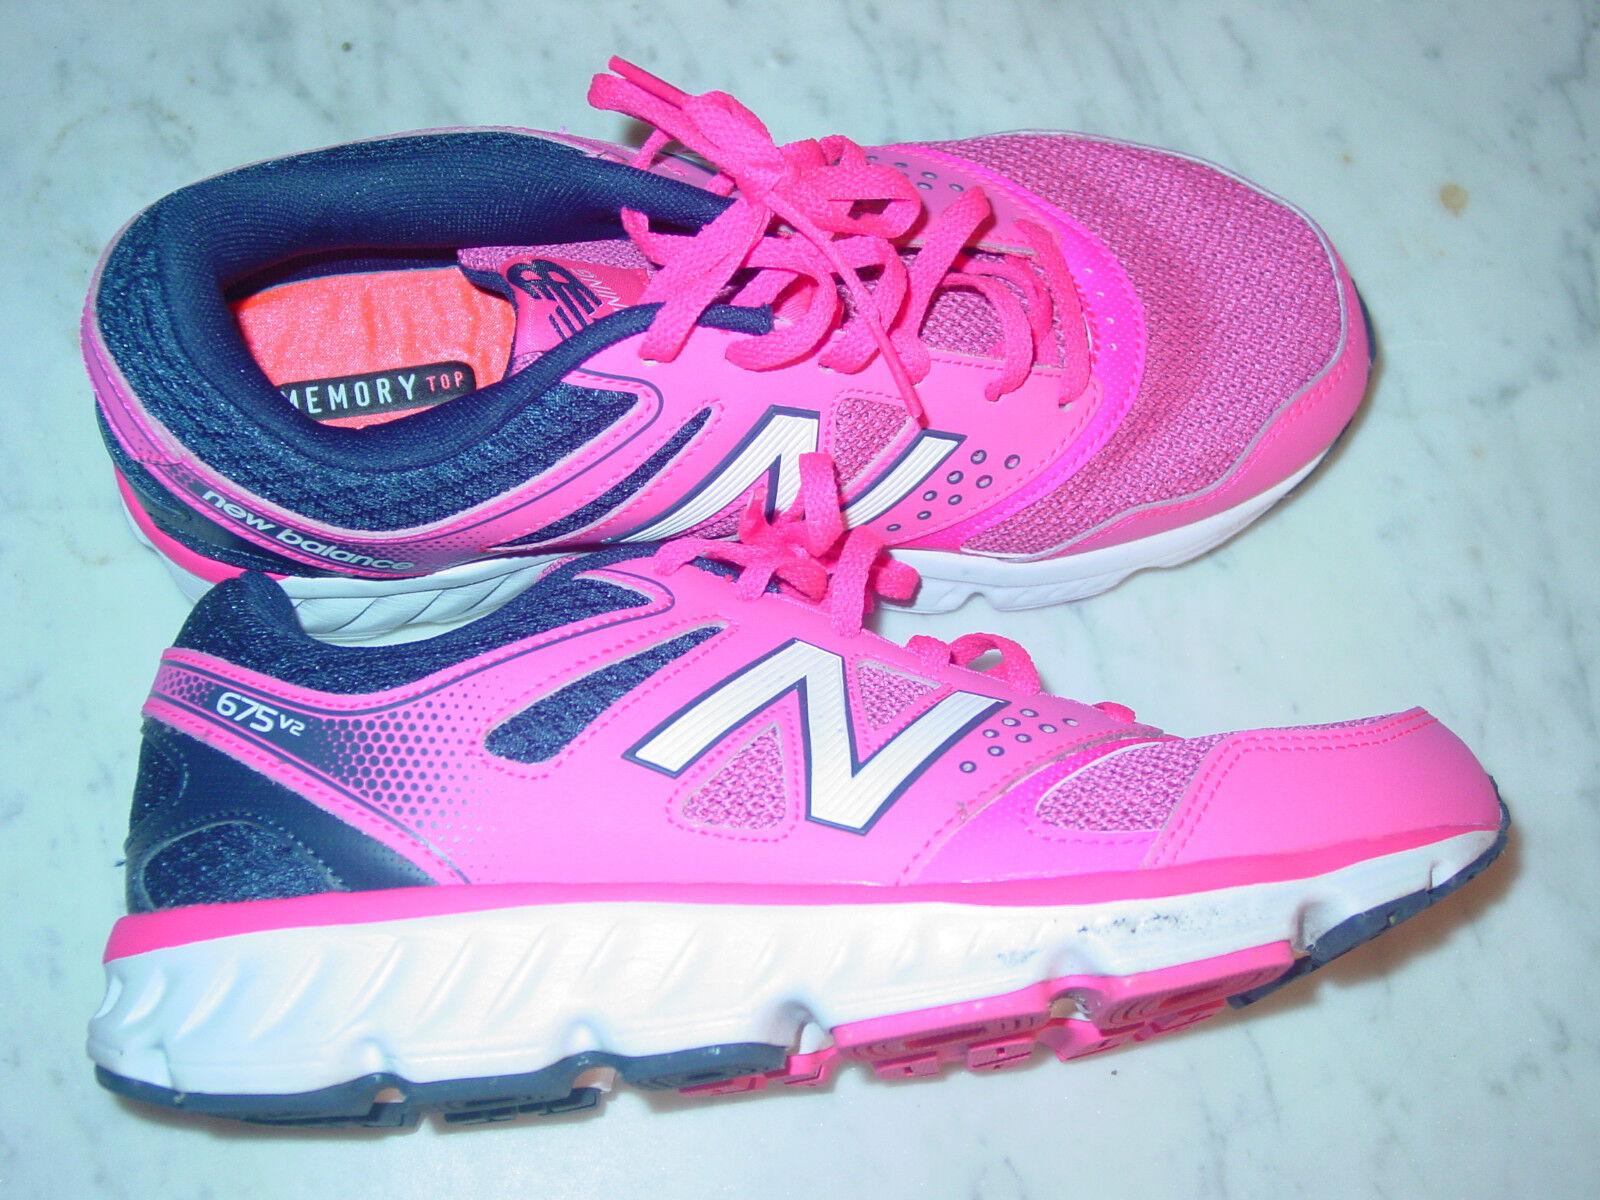 2015 damen damen damen New Balance 675  W675PN2  Rosa Navy Blau Running schuhe  Größe 10 641876